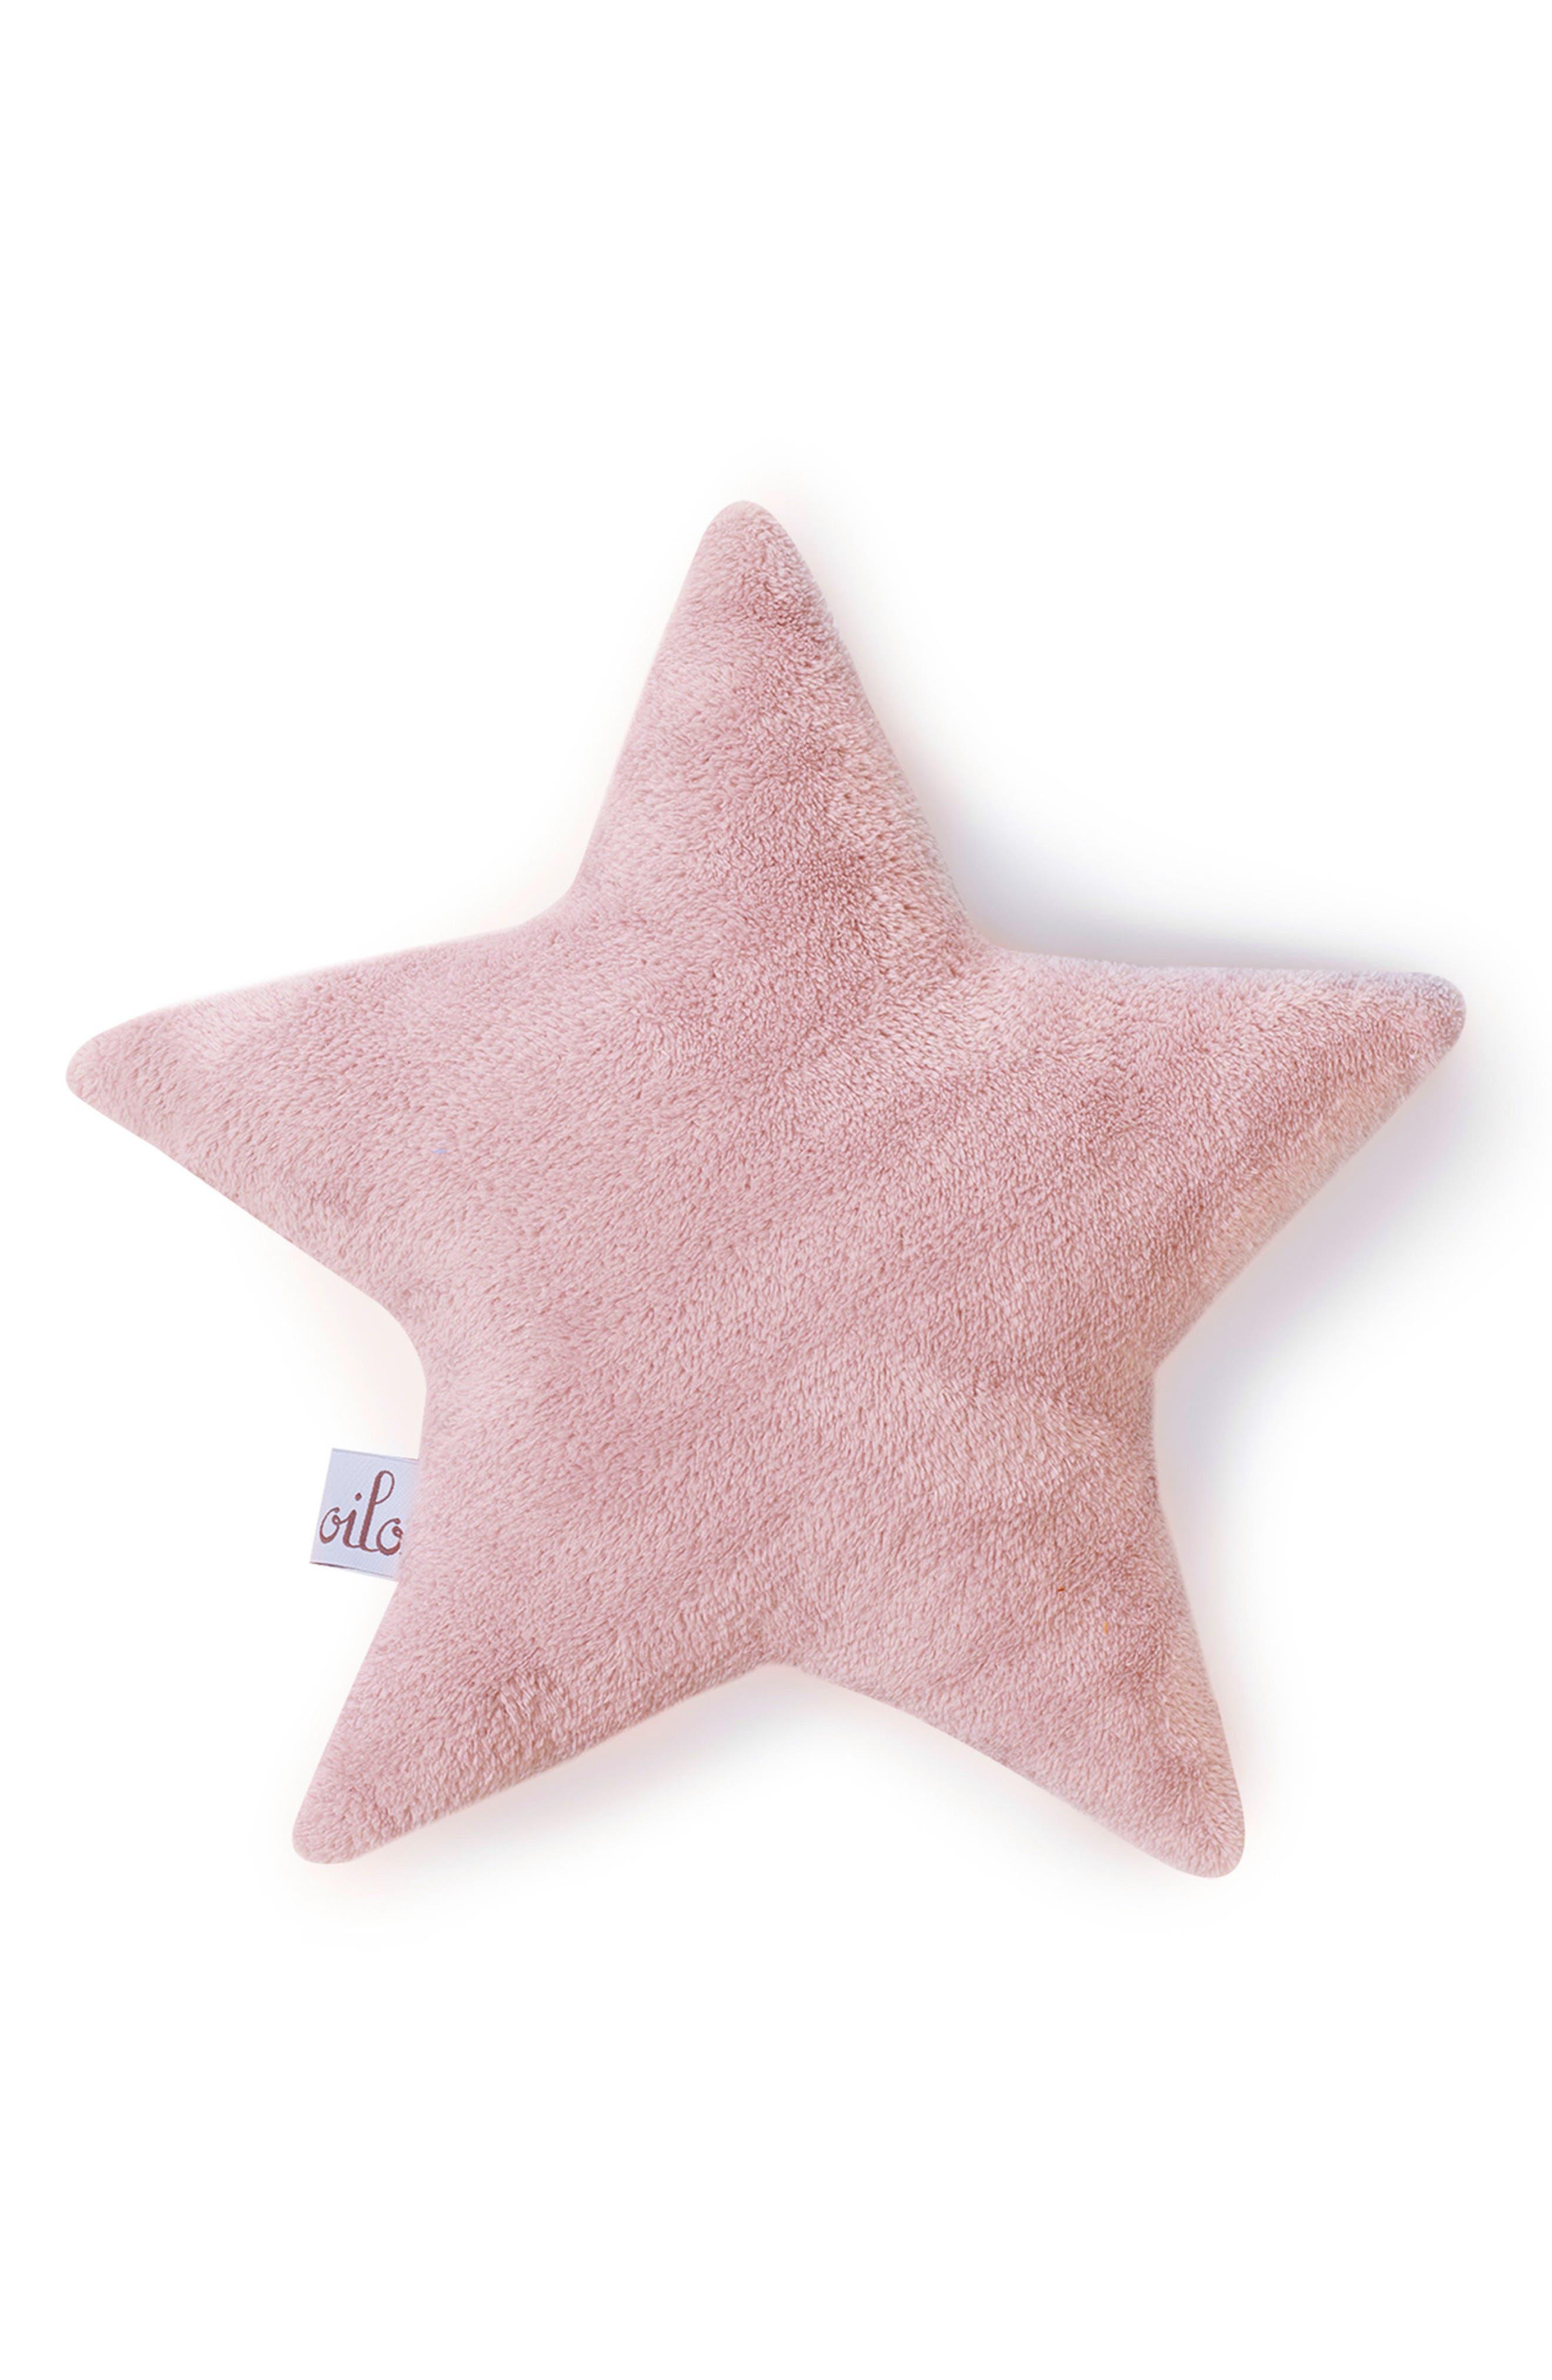 Prim Cuddle Blanket & Star Pillow Set,                             Alternate thumbnail 2, color,                             Prim